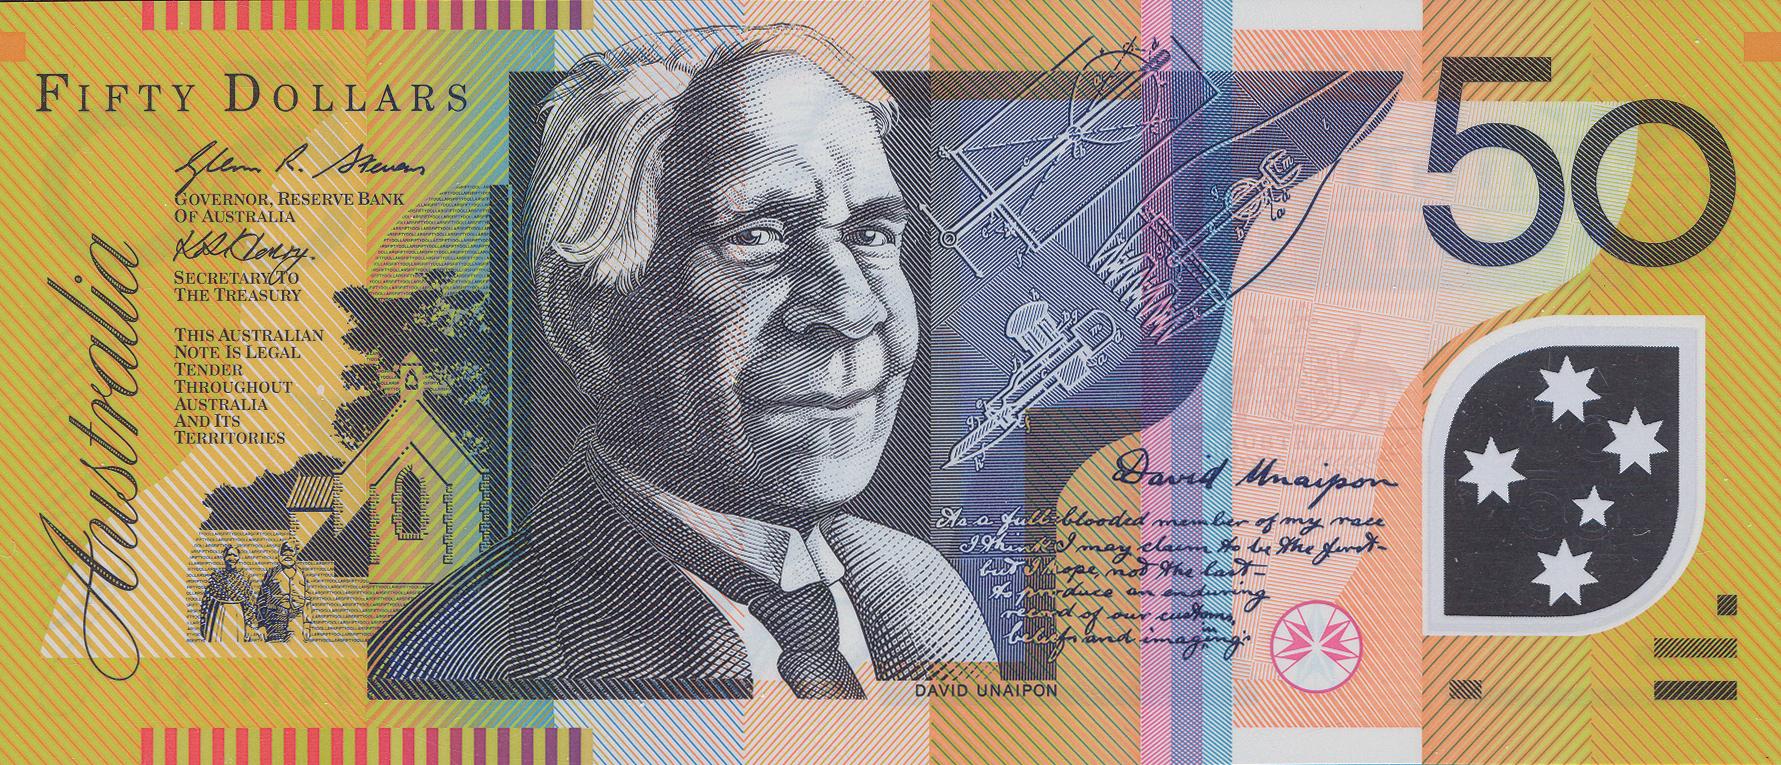 Australia 50 Dollars Banknote Good Condition Australian Banknote Bill